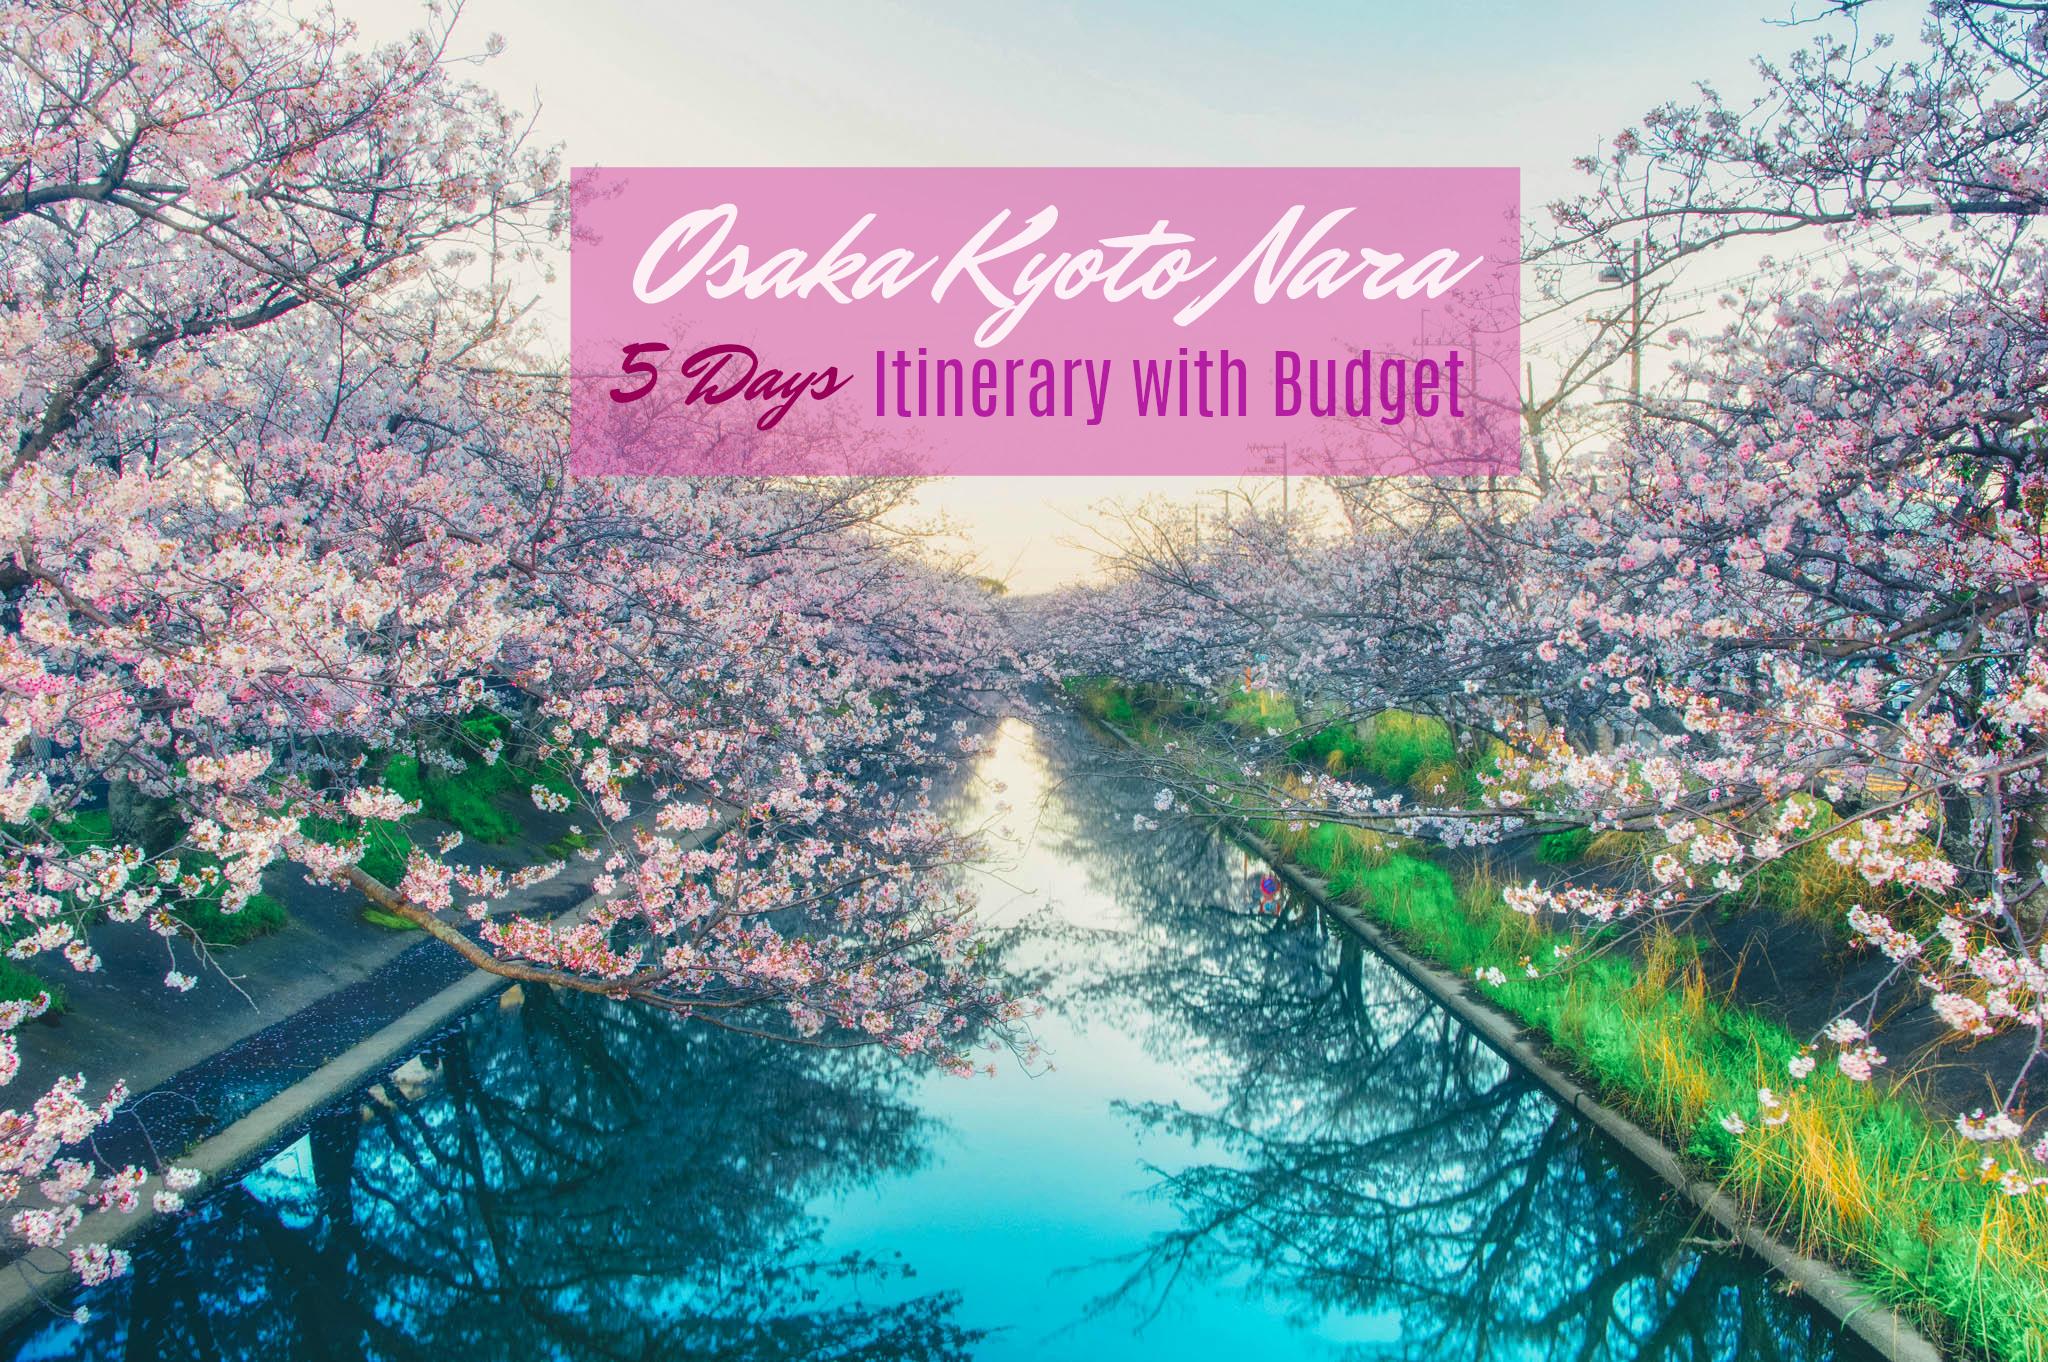 OSAKA-KYOTO-NARA ITINERARY 2018